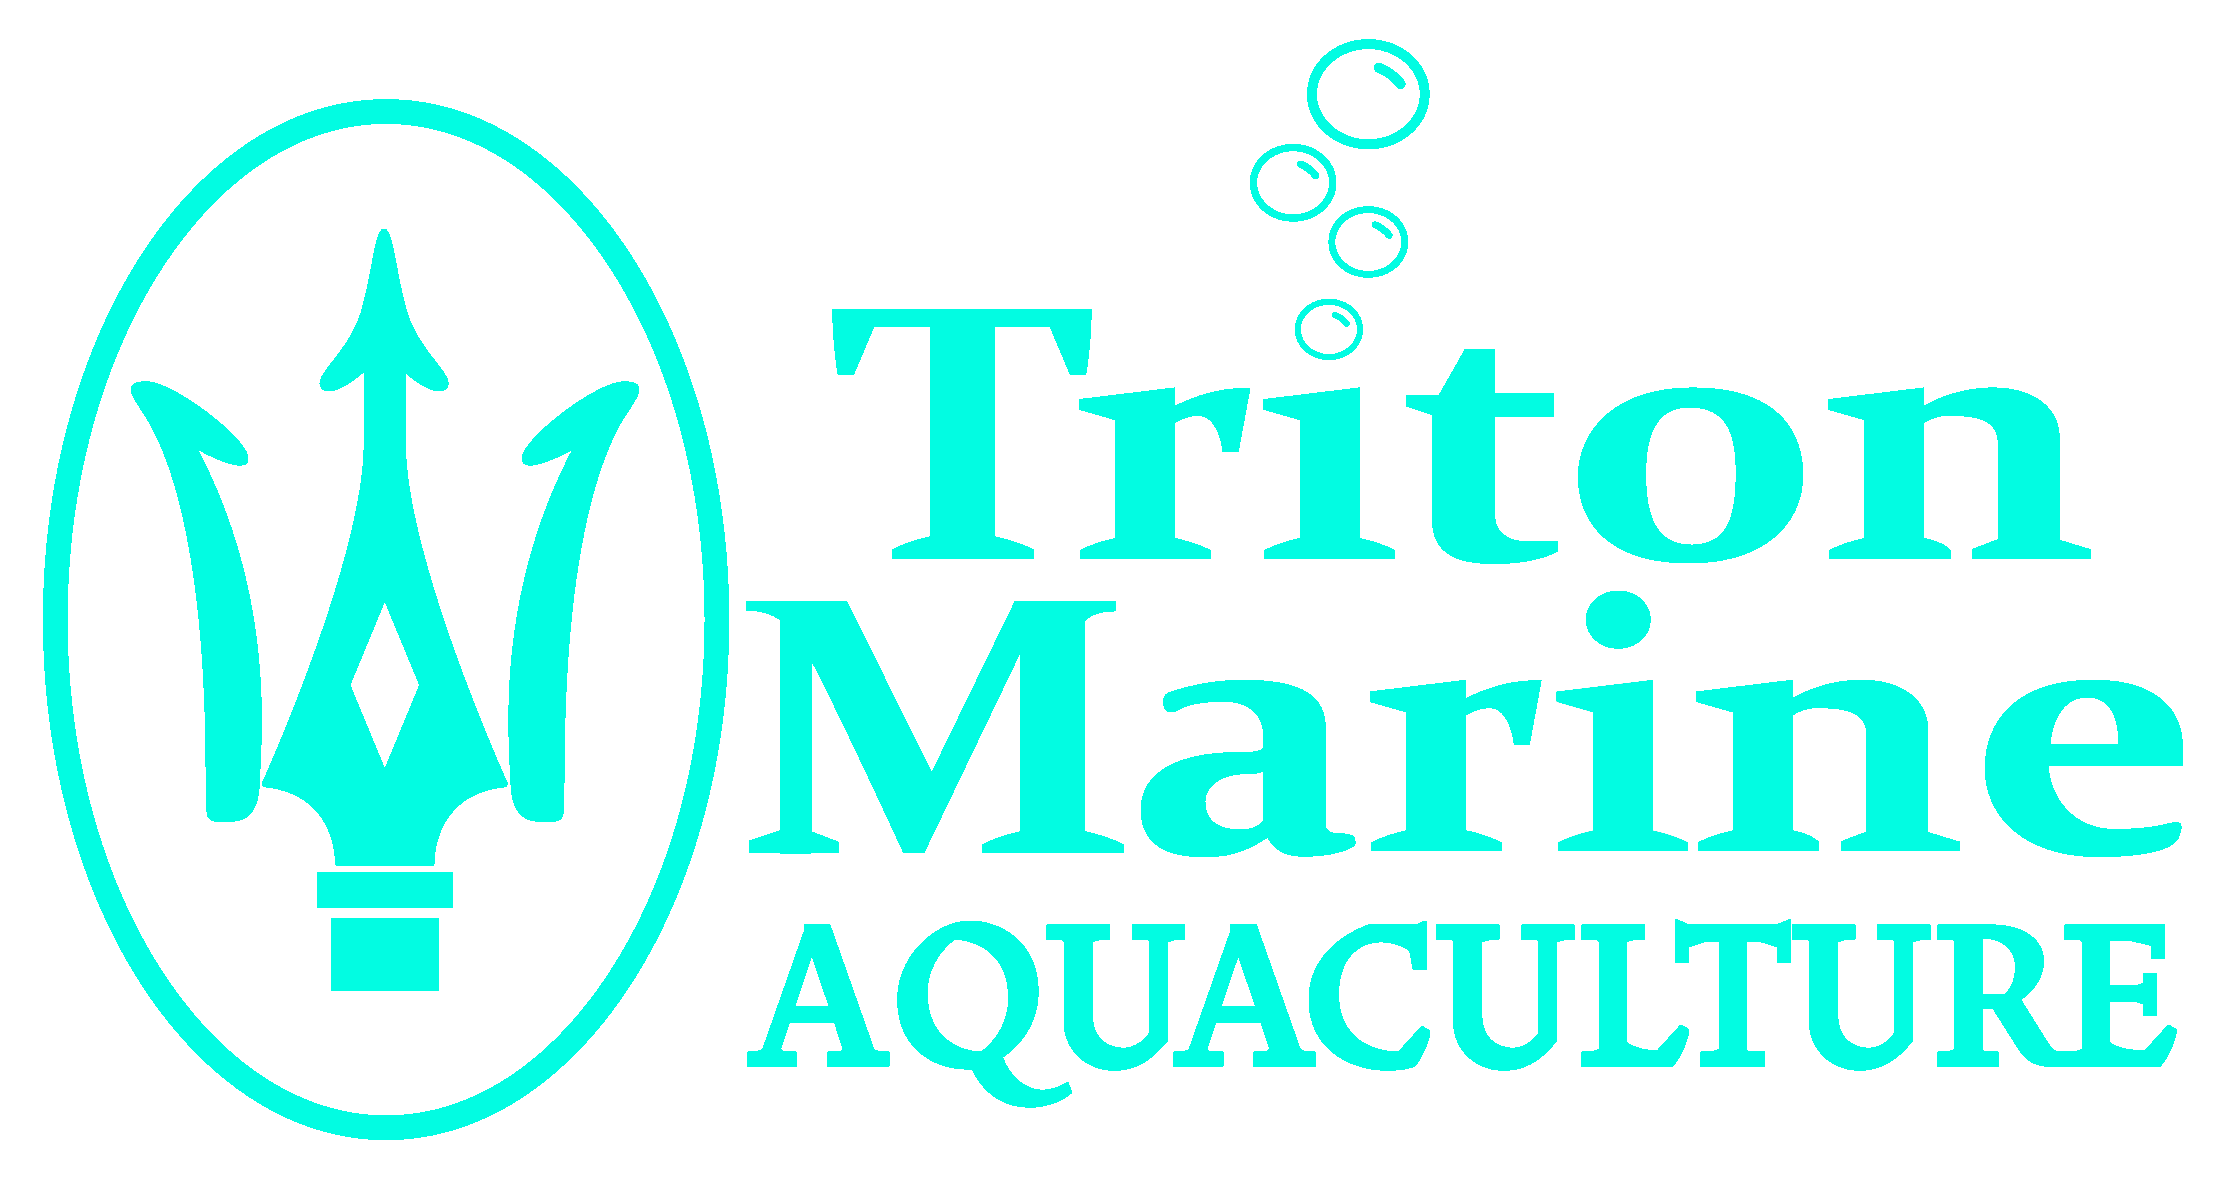 Wrasse - Fish Only Tanks - Triton Marine Aquaculture